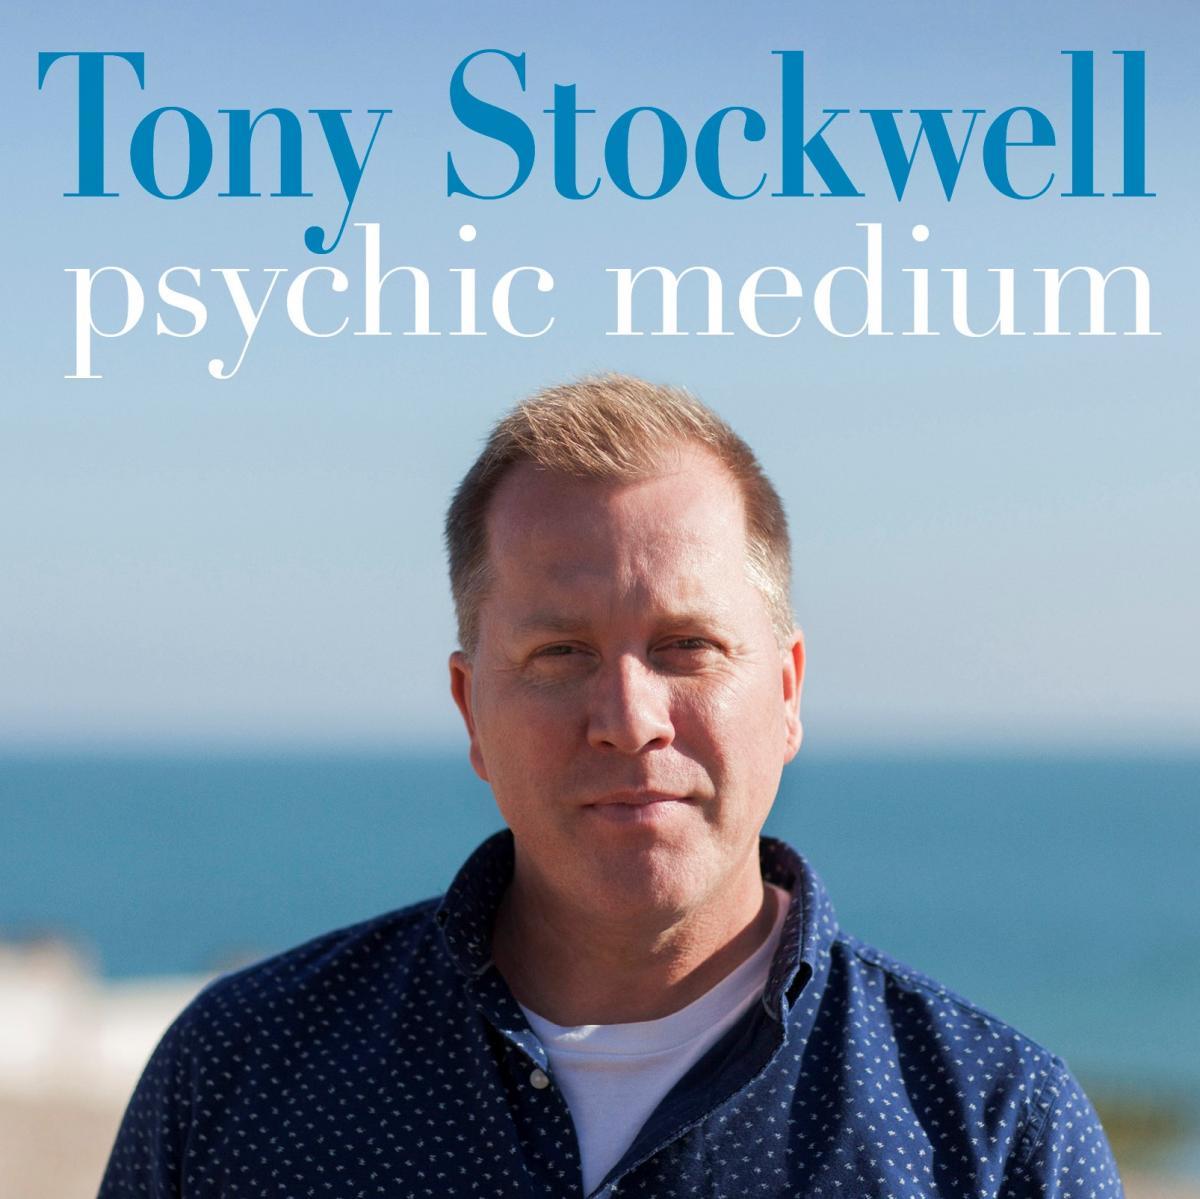 Tony Stockwell performing his new show, Psychic Medium